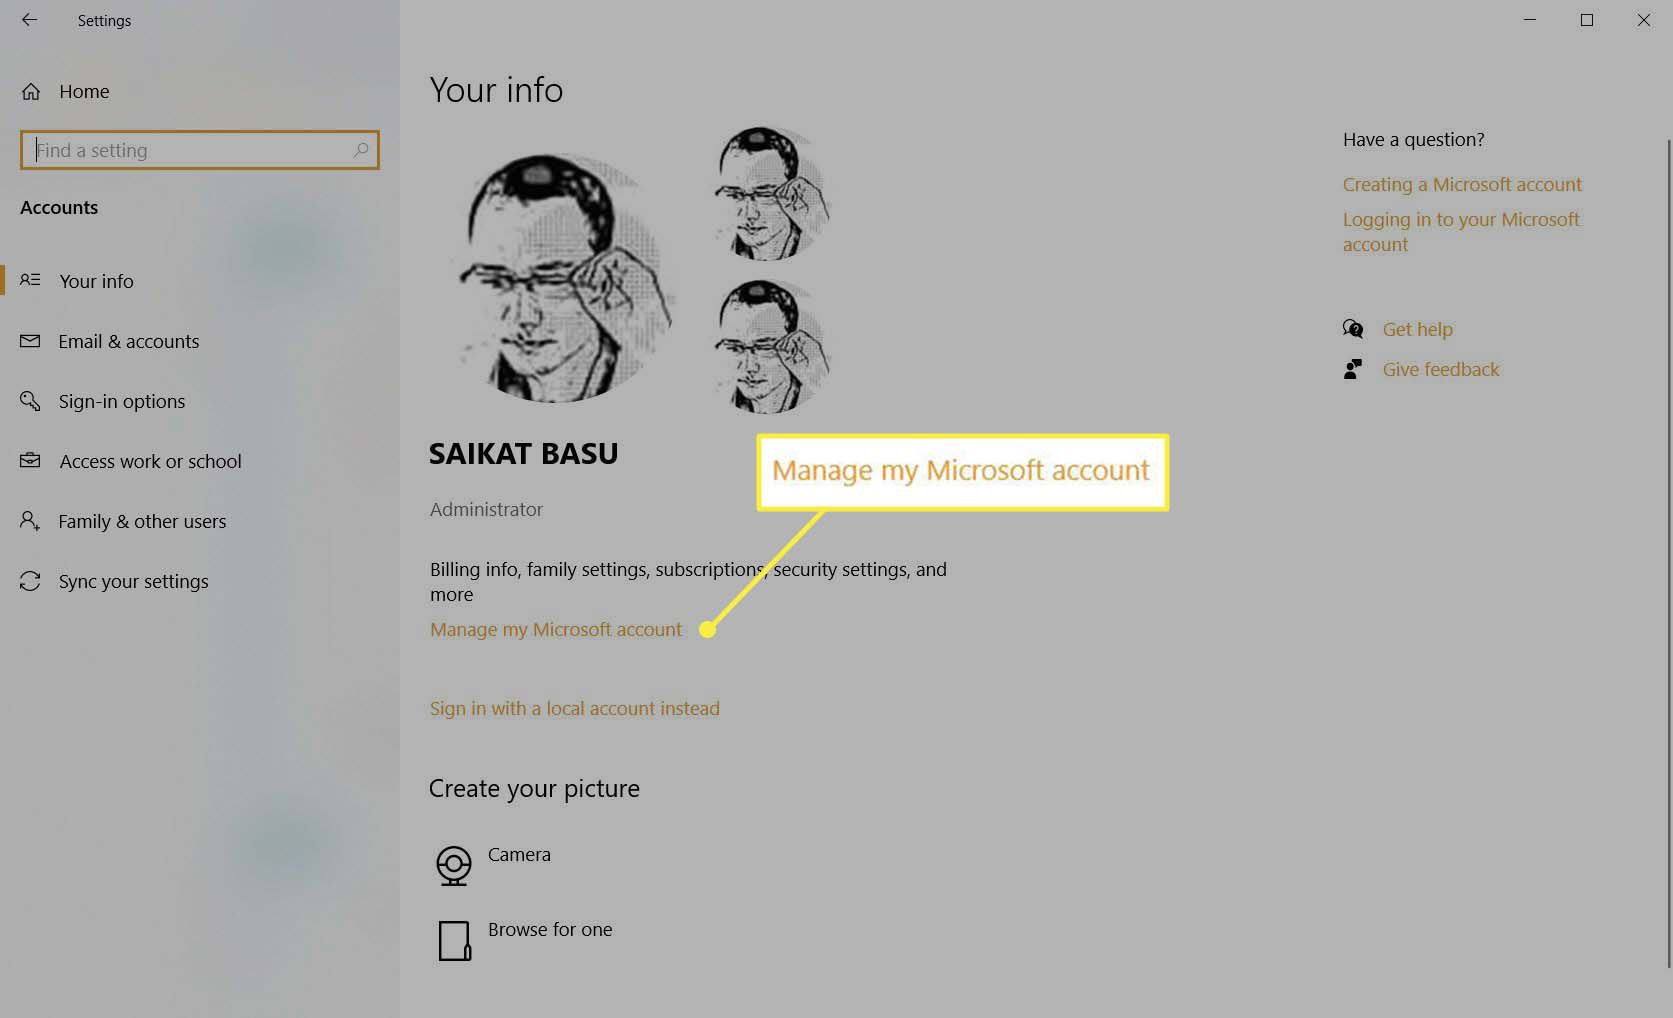 Your info screen in Windows Settings.